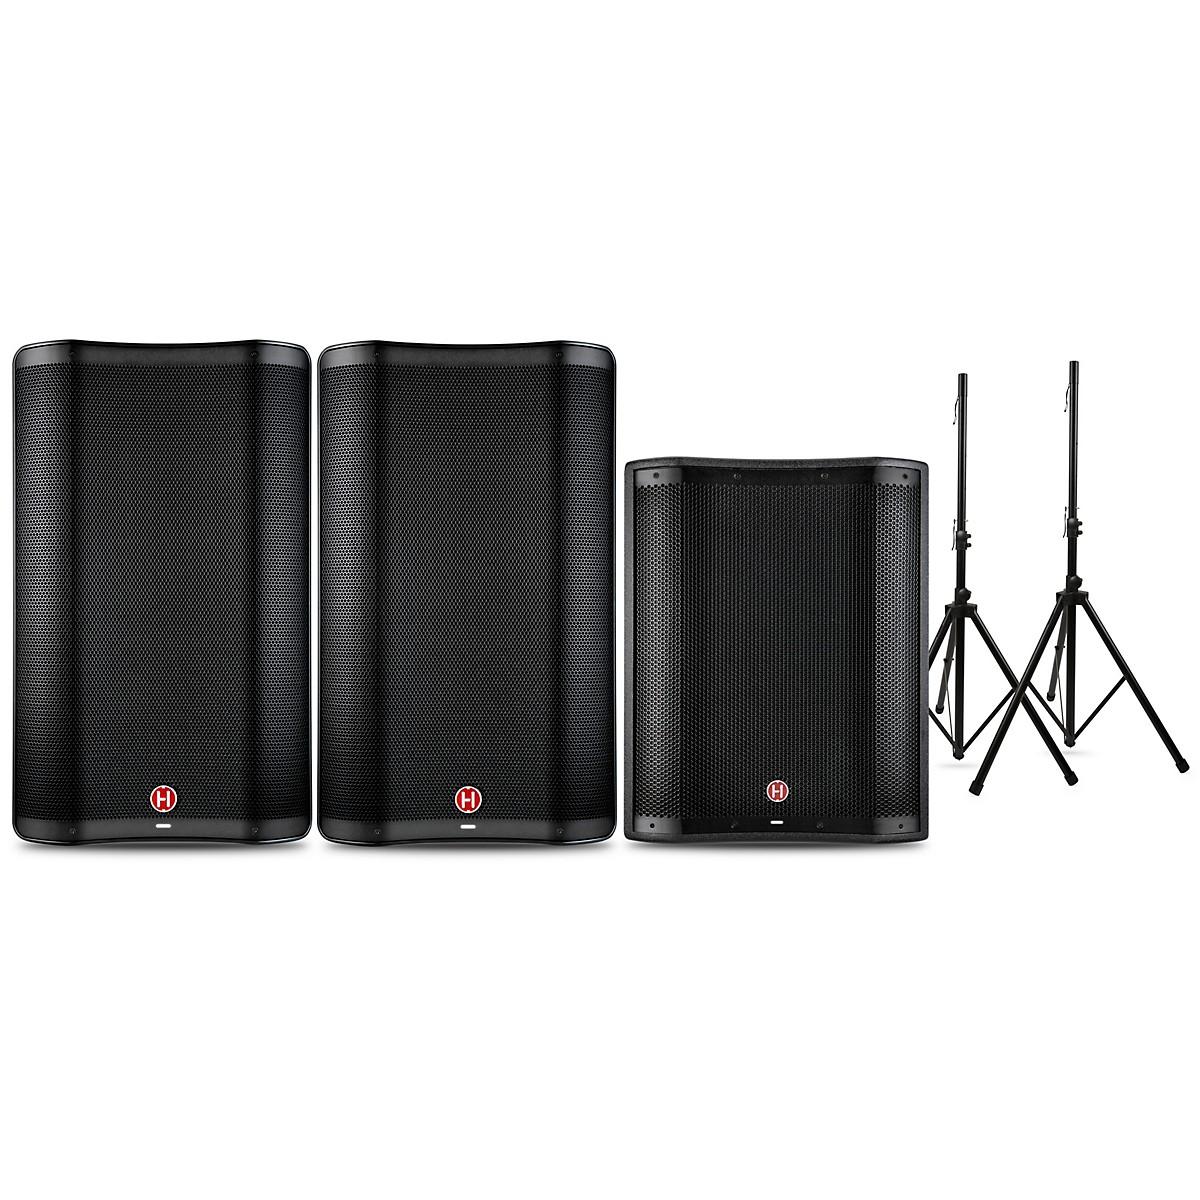 Harbinger VARI 2300 Series Powered Speakers and V2318S Subwoofer Package with Speaker Stands